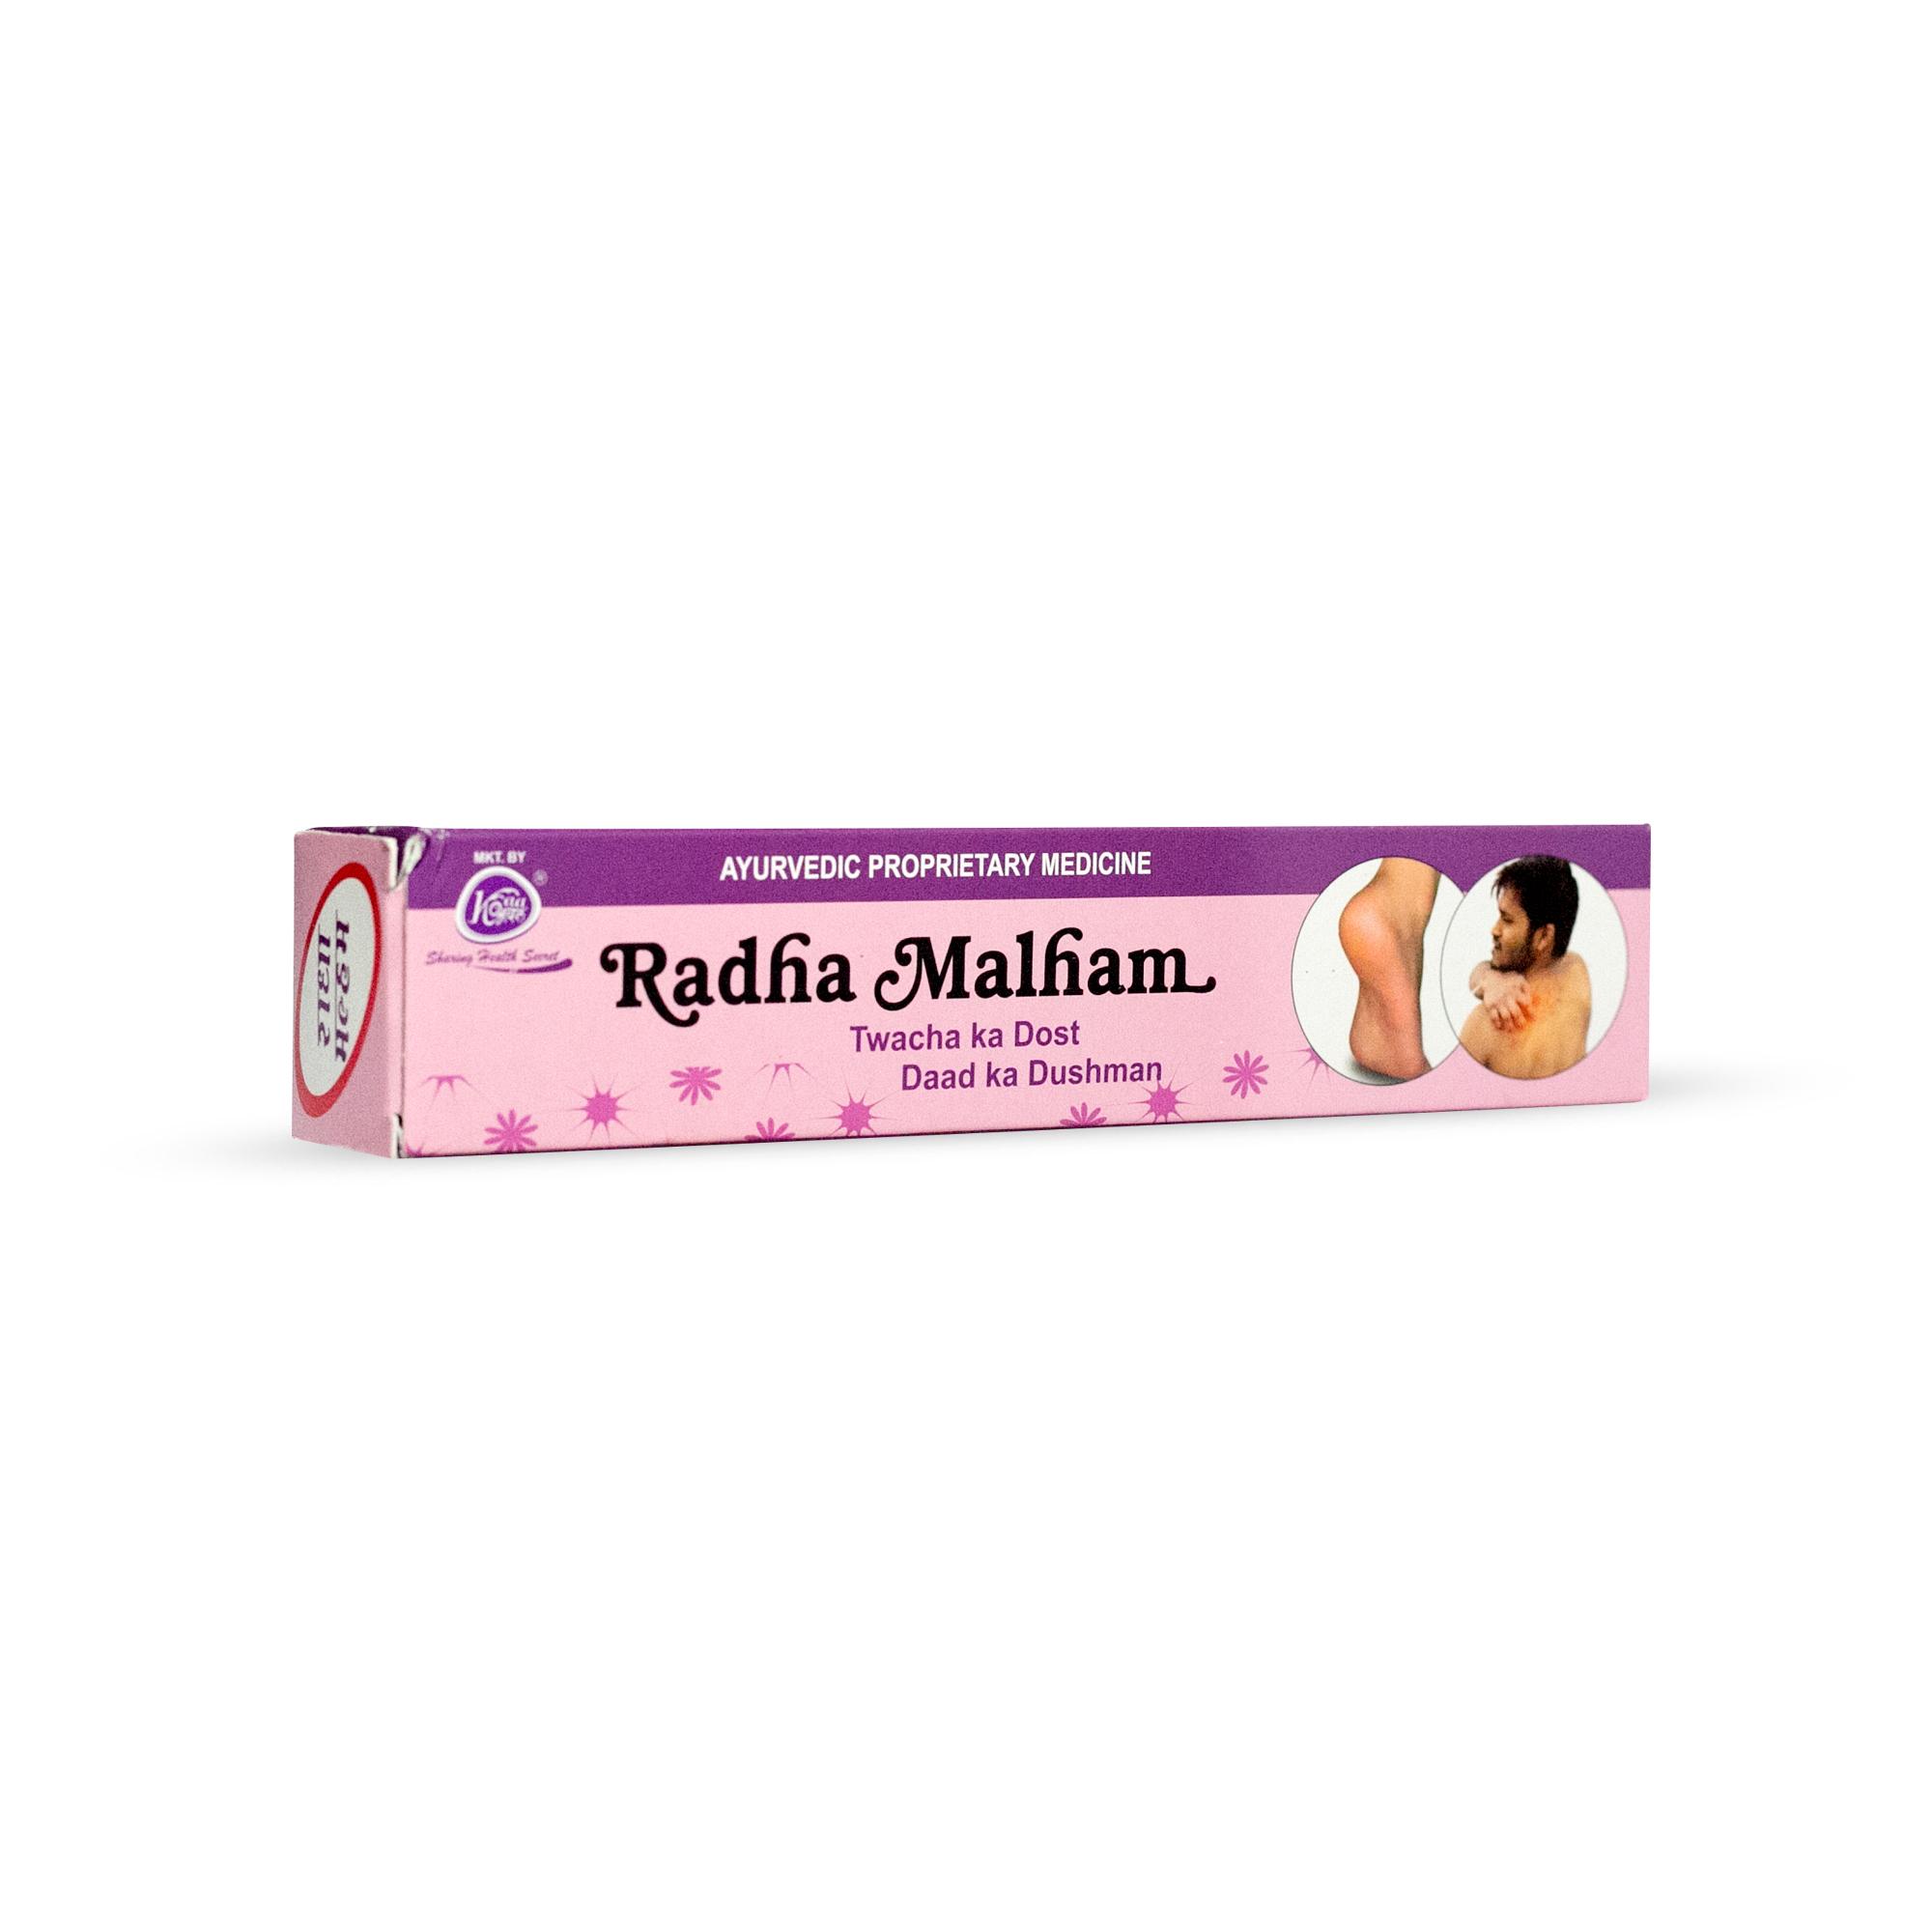 Radha Malham